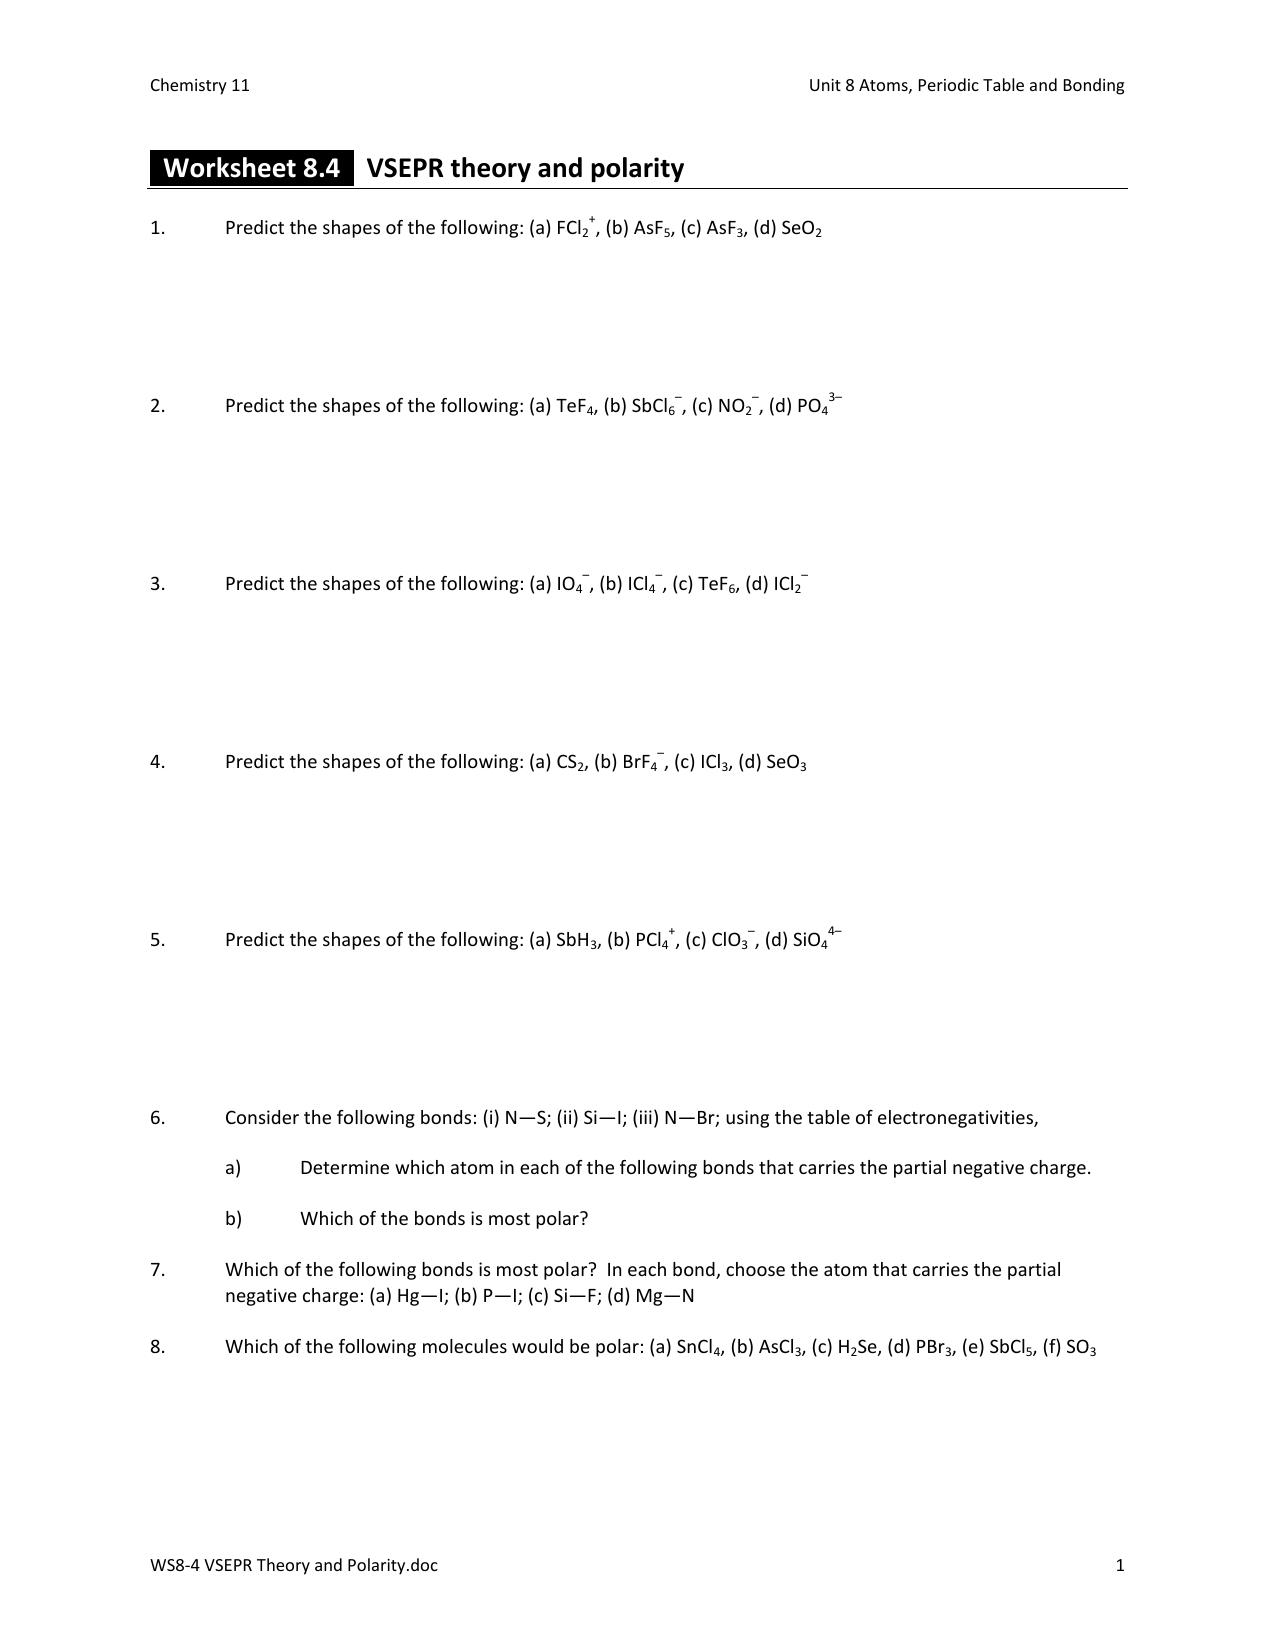 worksheet Vsepr Worksheet With Answers ws8 4 vsepr theory and polarity